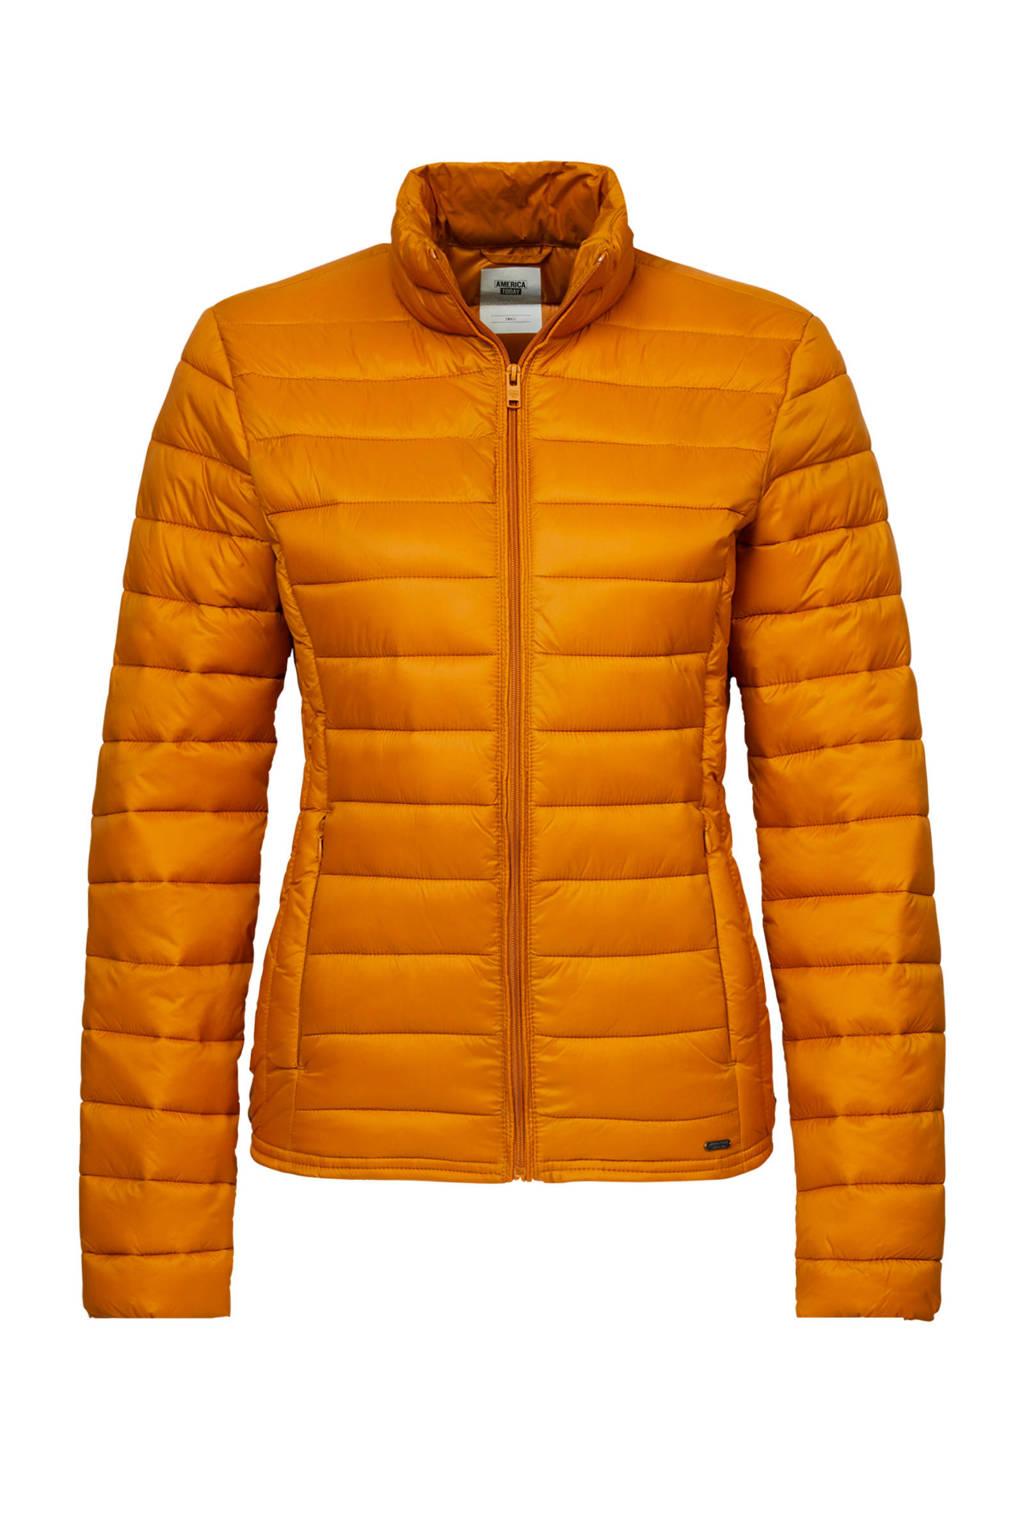 America Today gewatteerde tussenjas oranje, Oranje